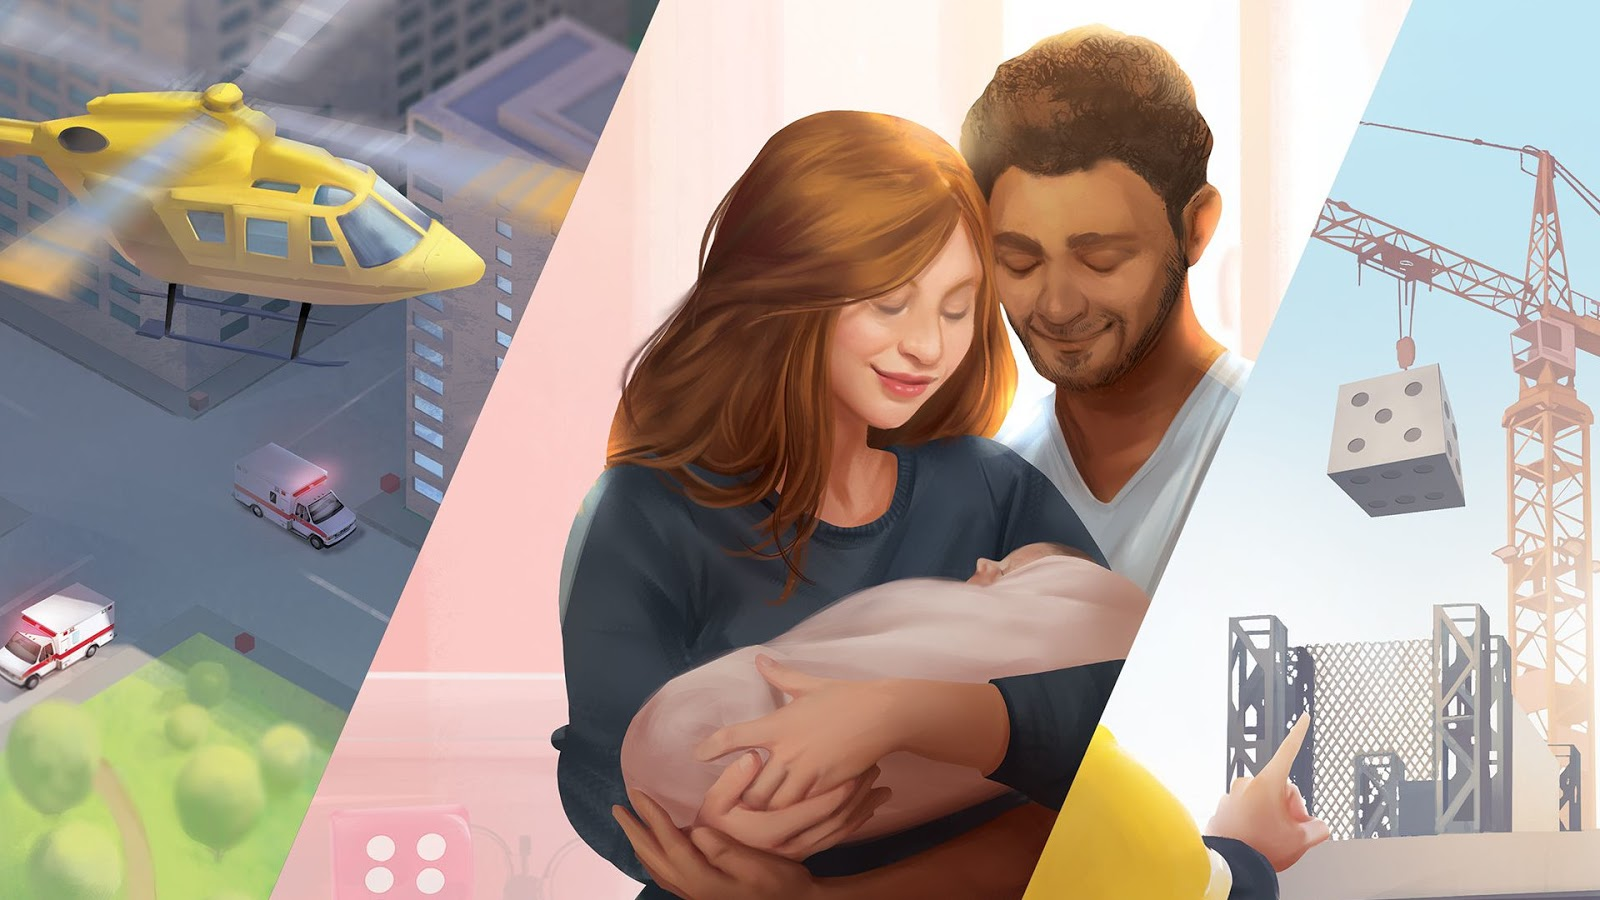 Kickstarter Highlights - Dice Hospital Expansion Communtuty Care